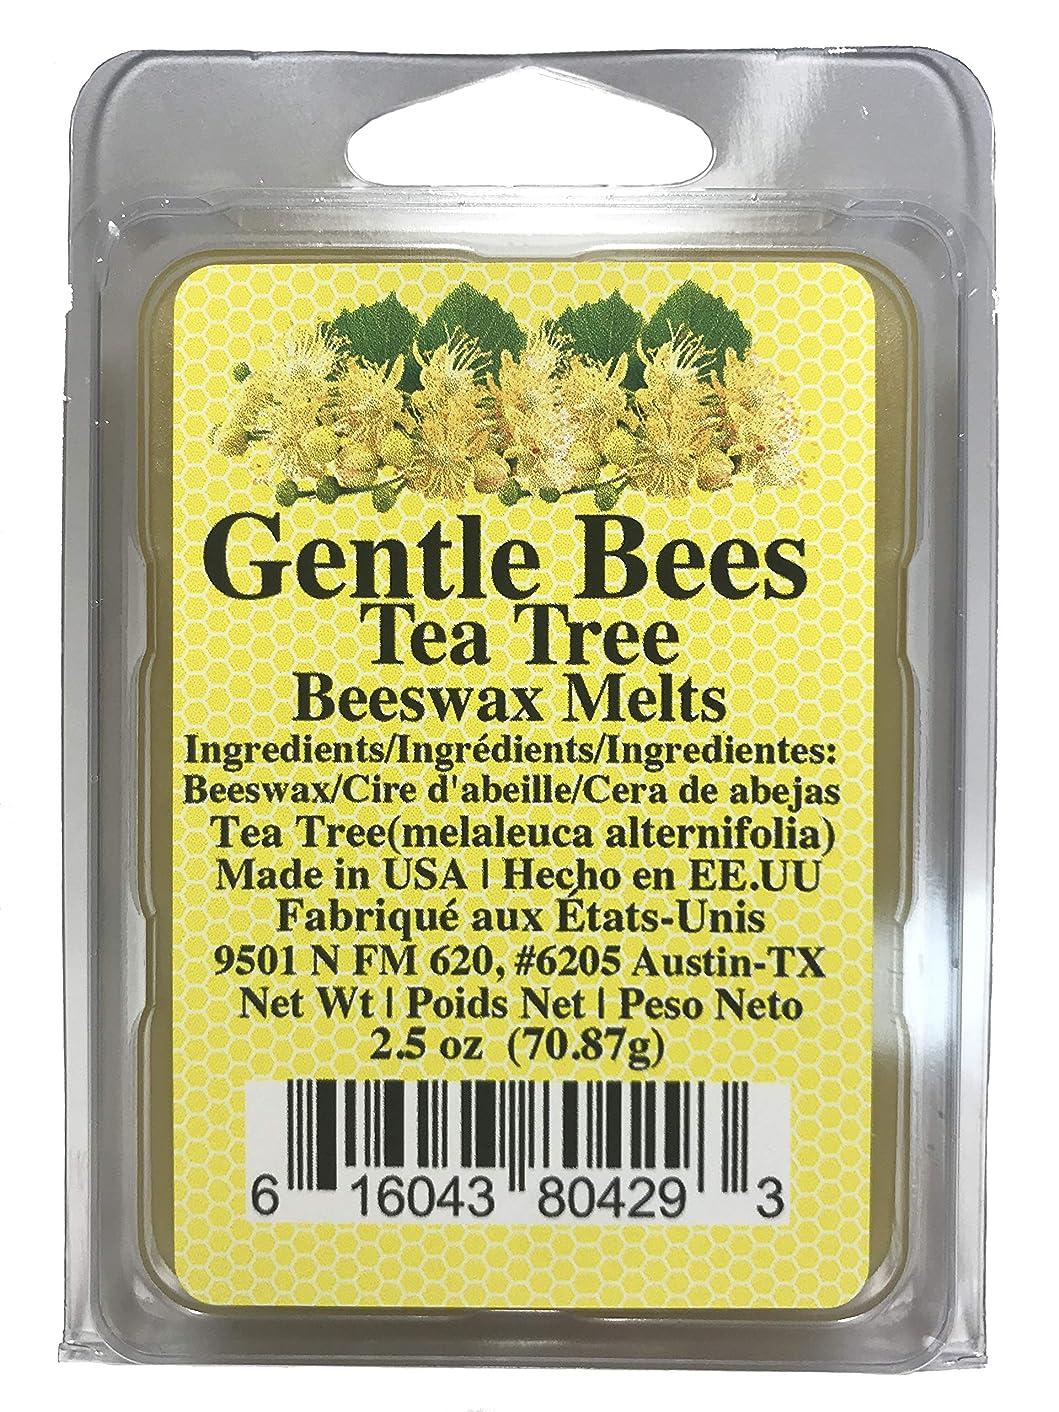 Gentle Bees Organic Tea Tree Beeswax Melts, 2.5 Ounces